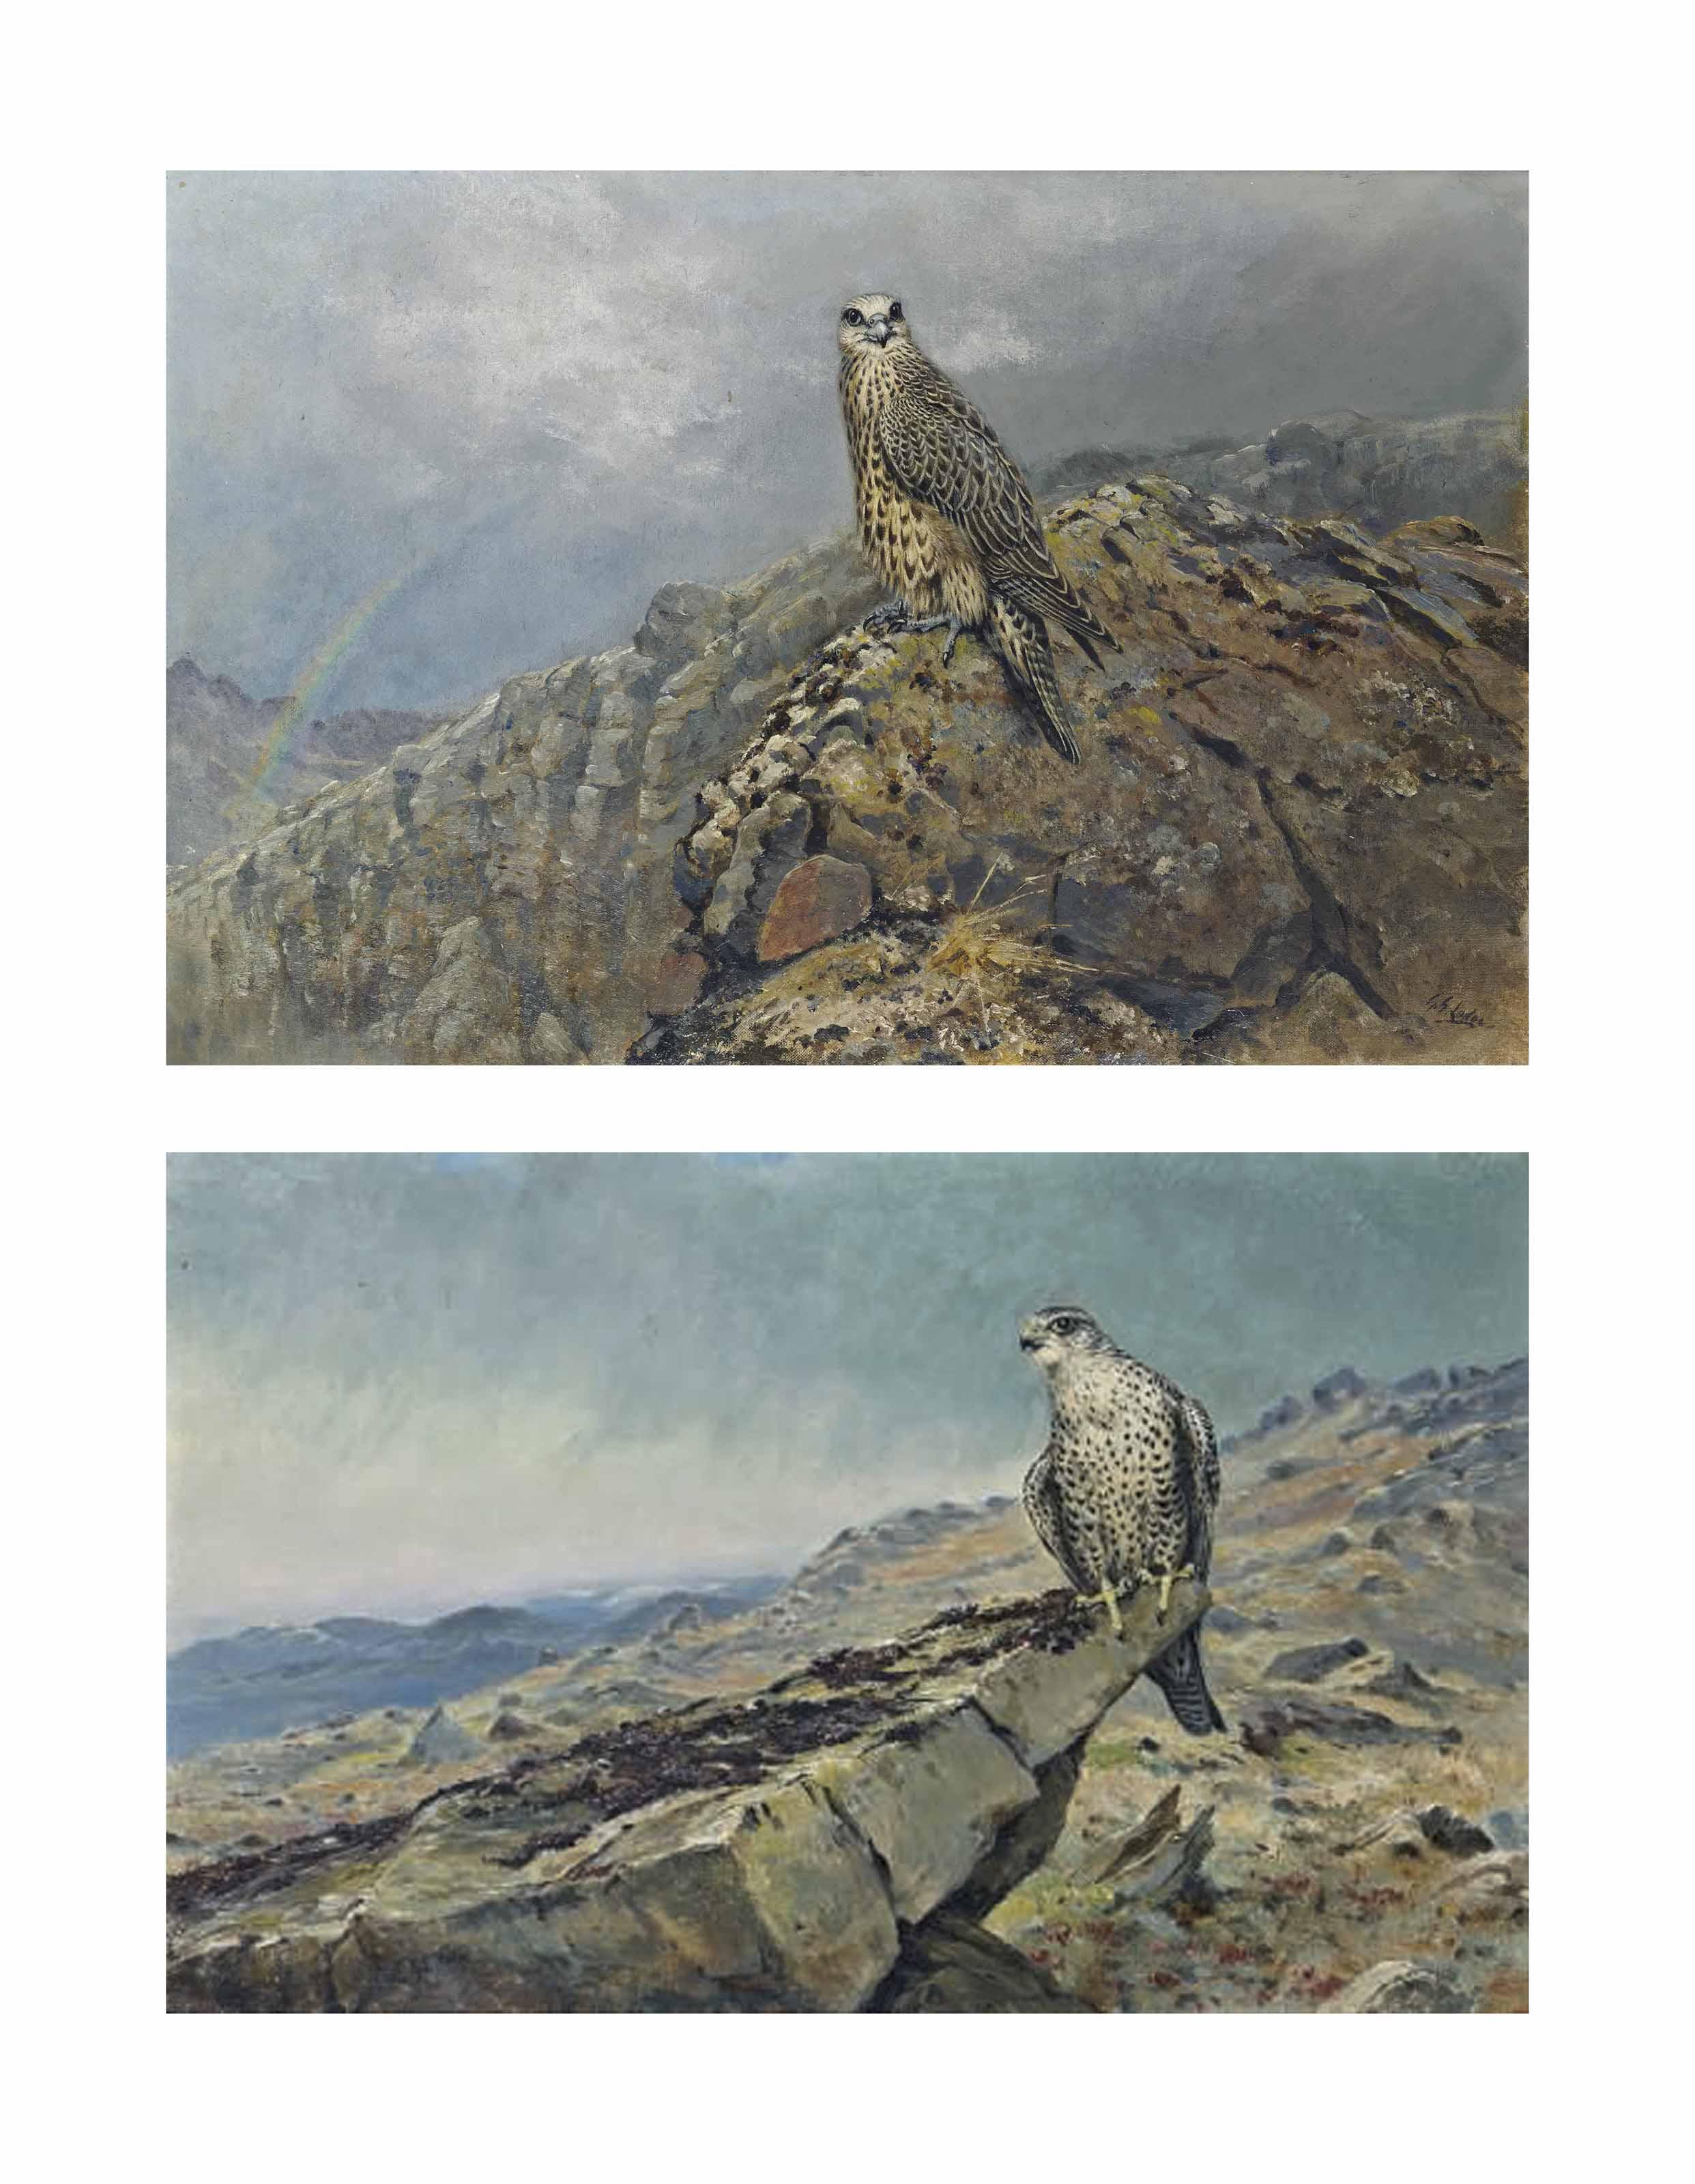 Gyr falcon on a rocky crag; and Gyr falcon with a rainbow beyond